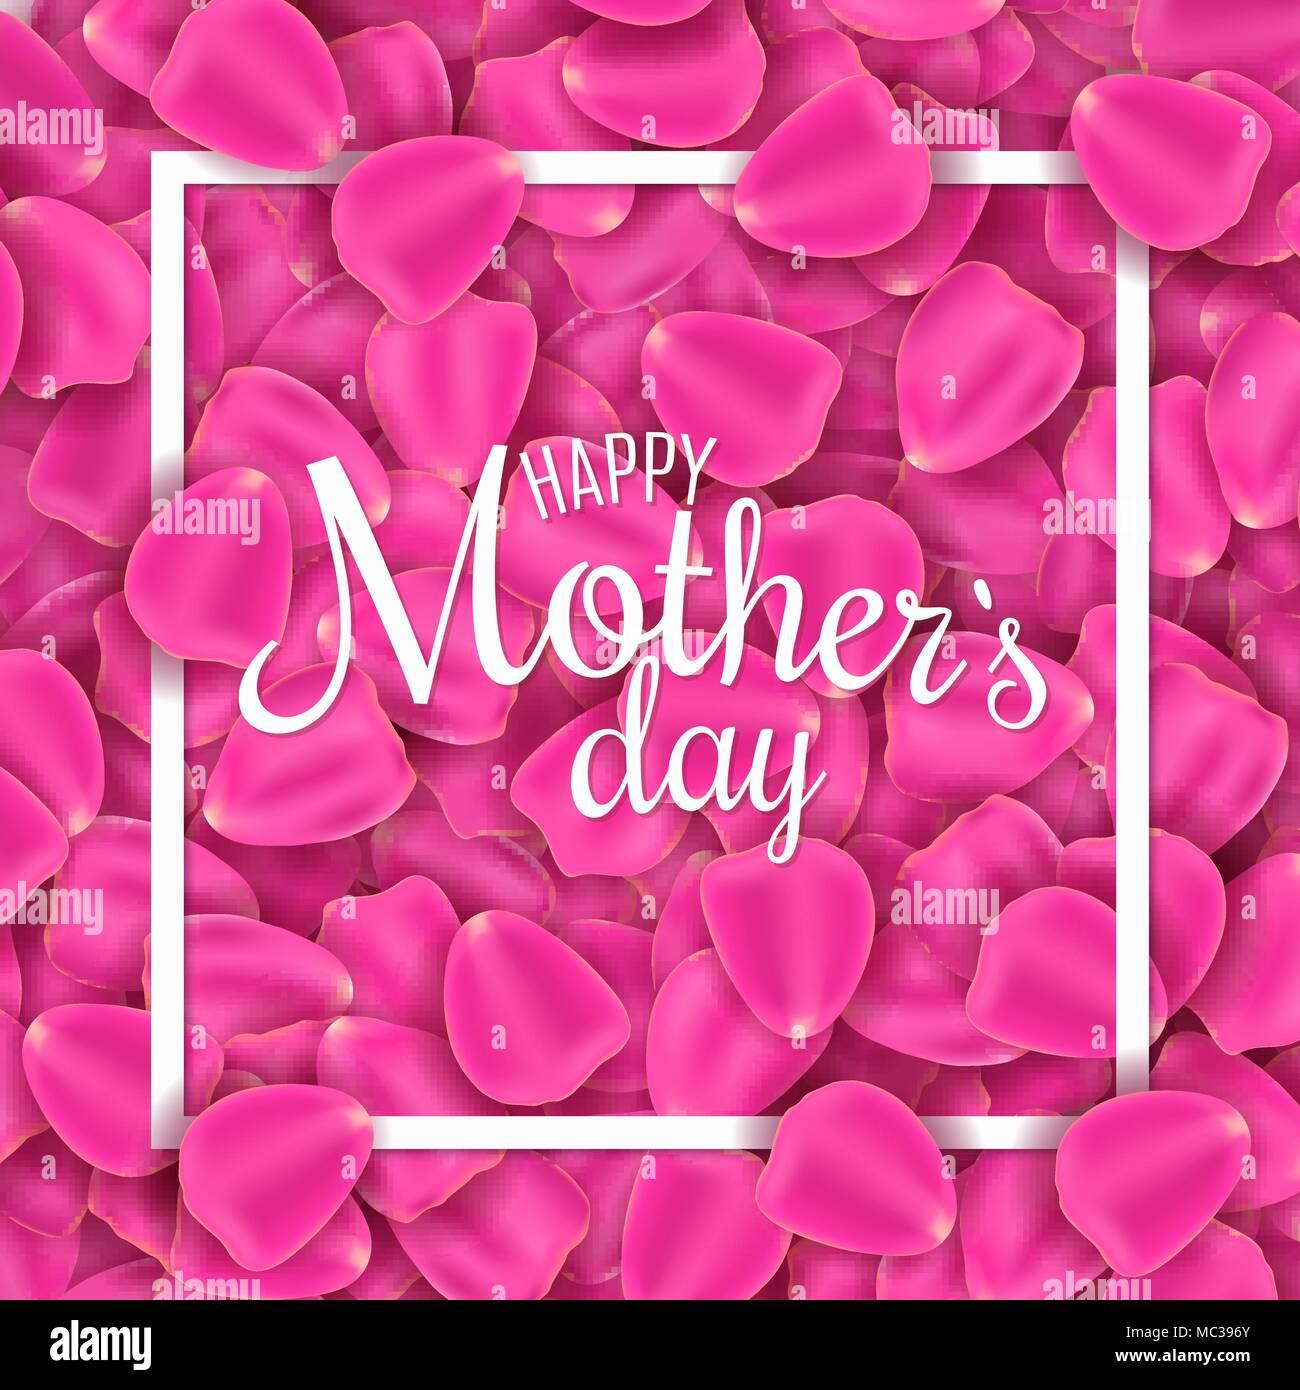 I Love You Mom Vector Vectors Stockfotos & I Love You Mom Vector ...